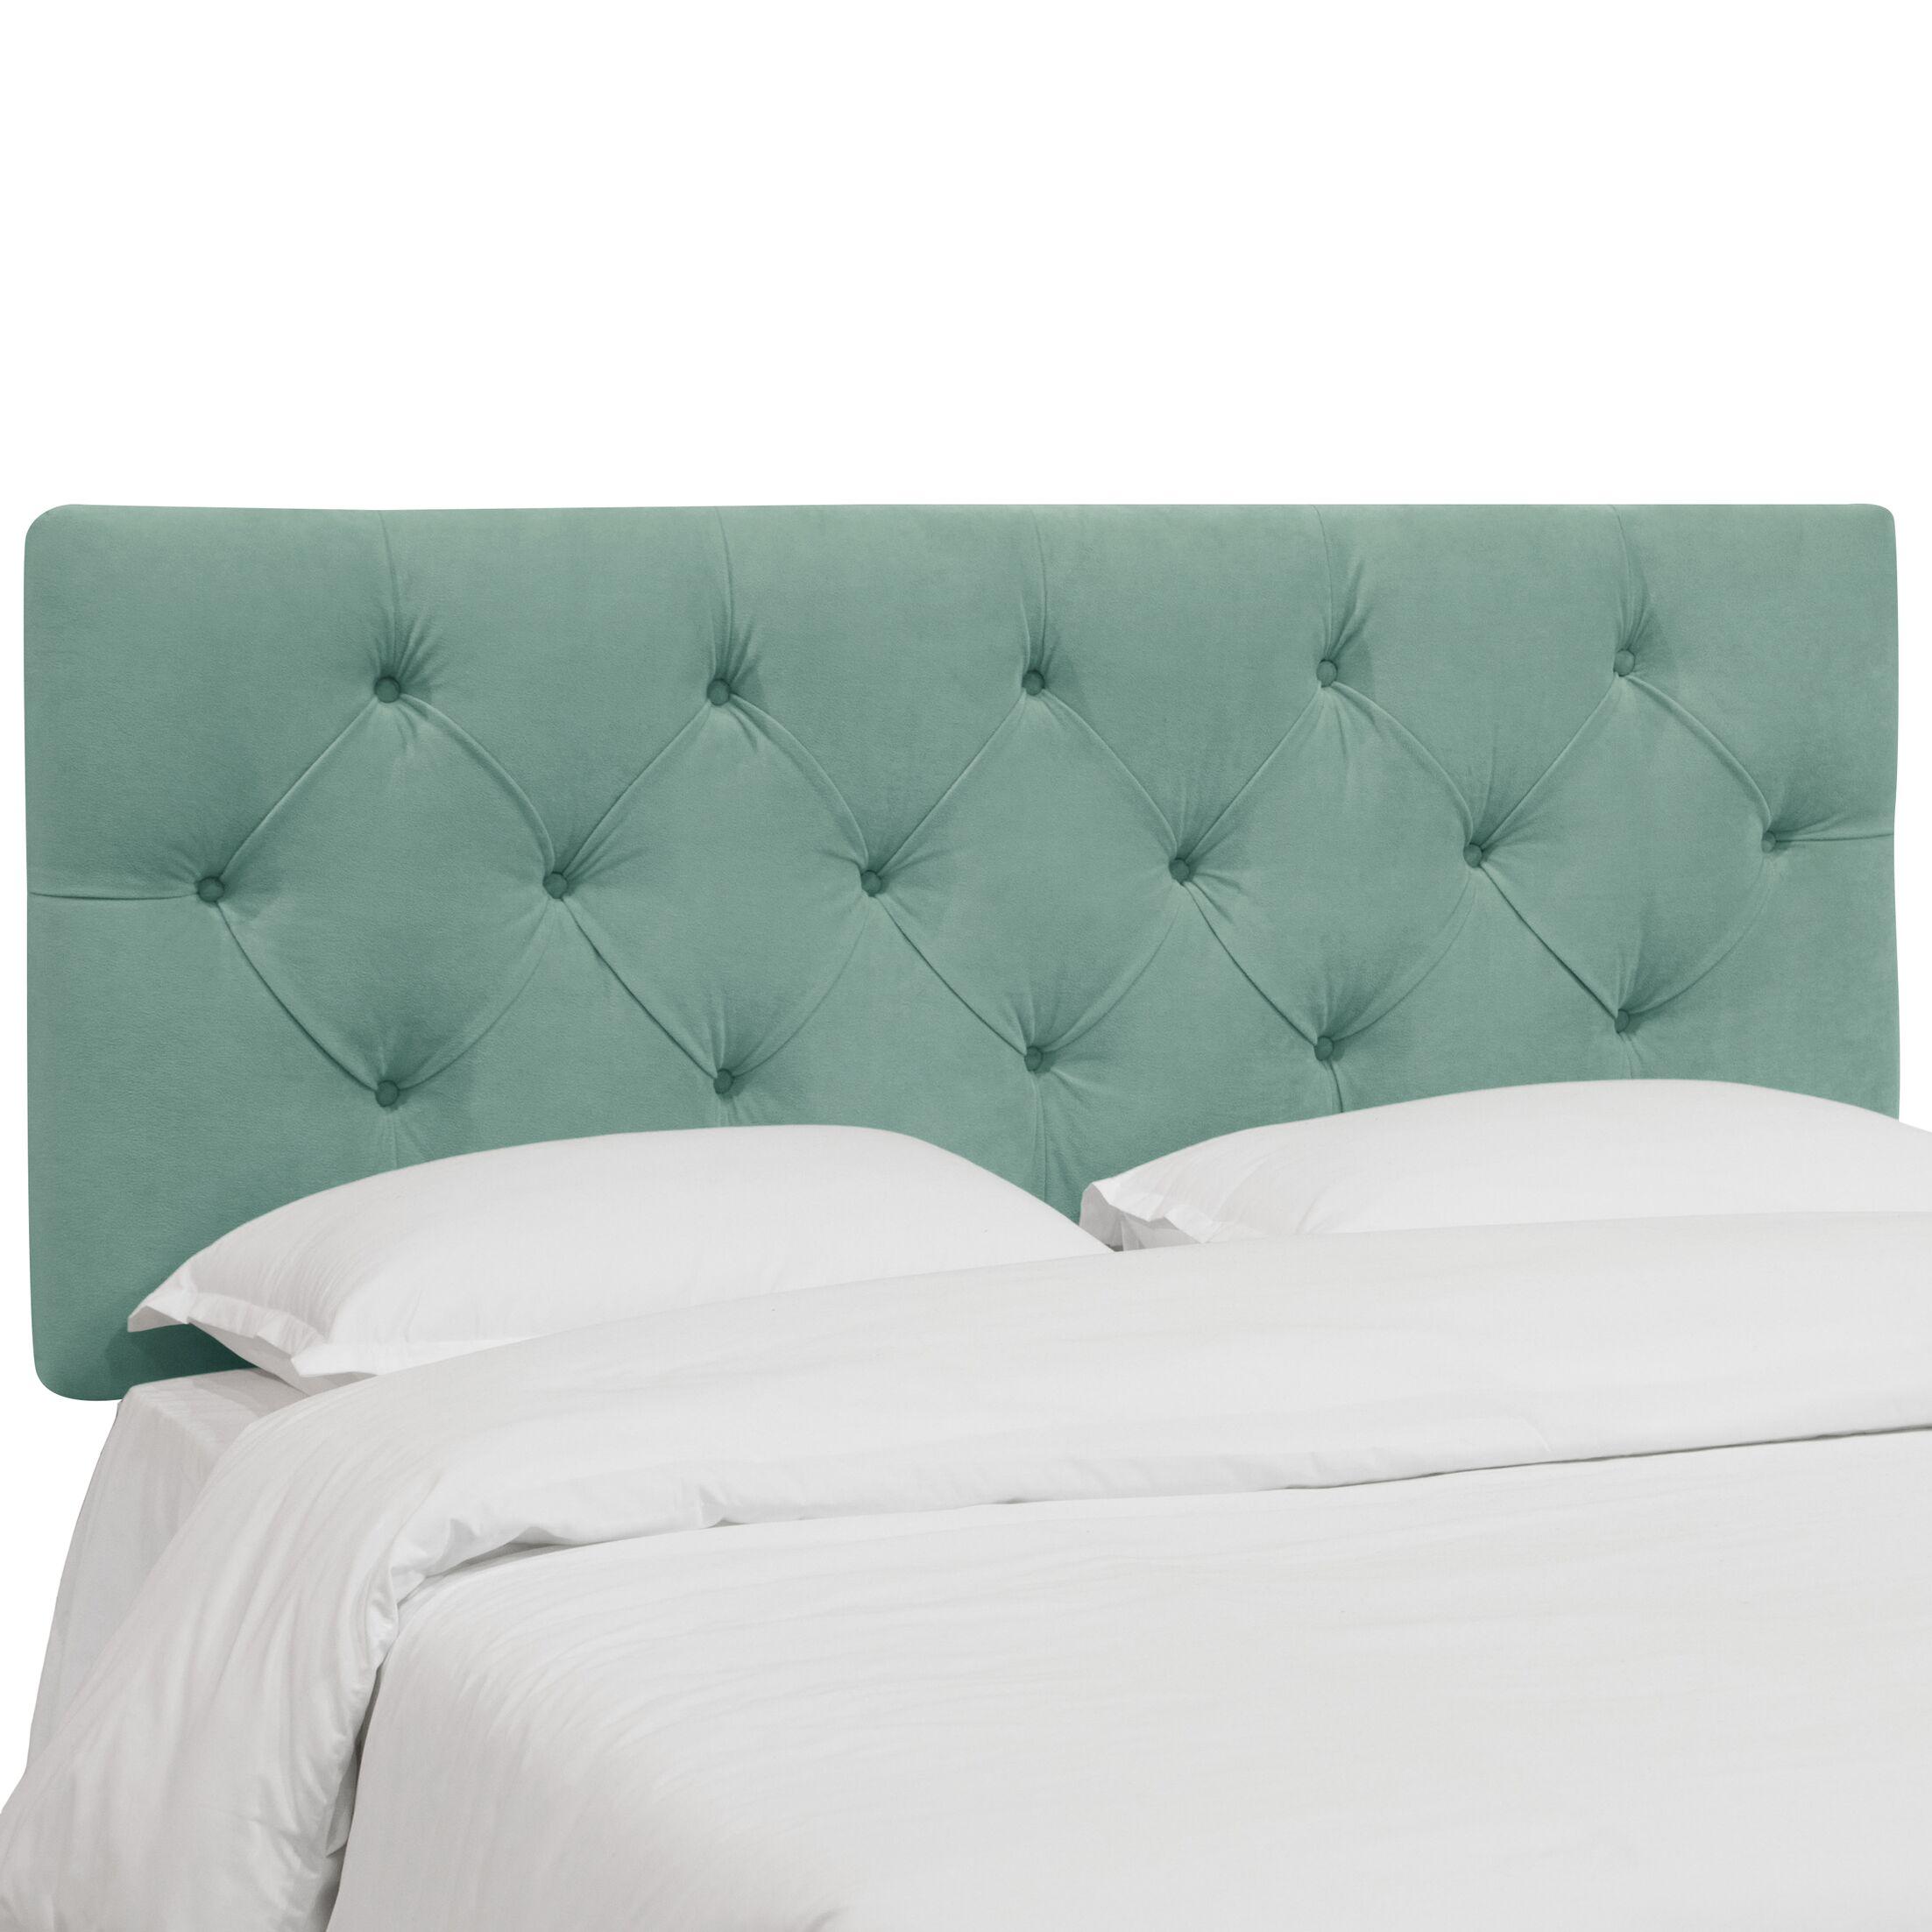 Plattekill Upholstered Panel Headboard Size: Queen, Upholstery: Caribbean